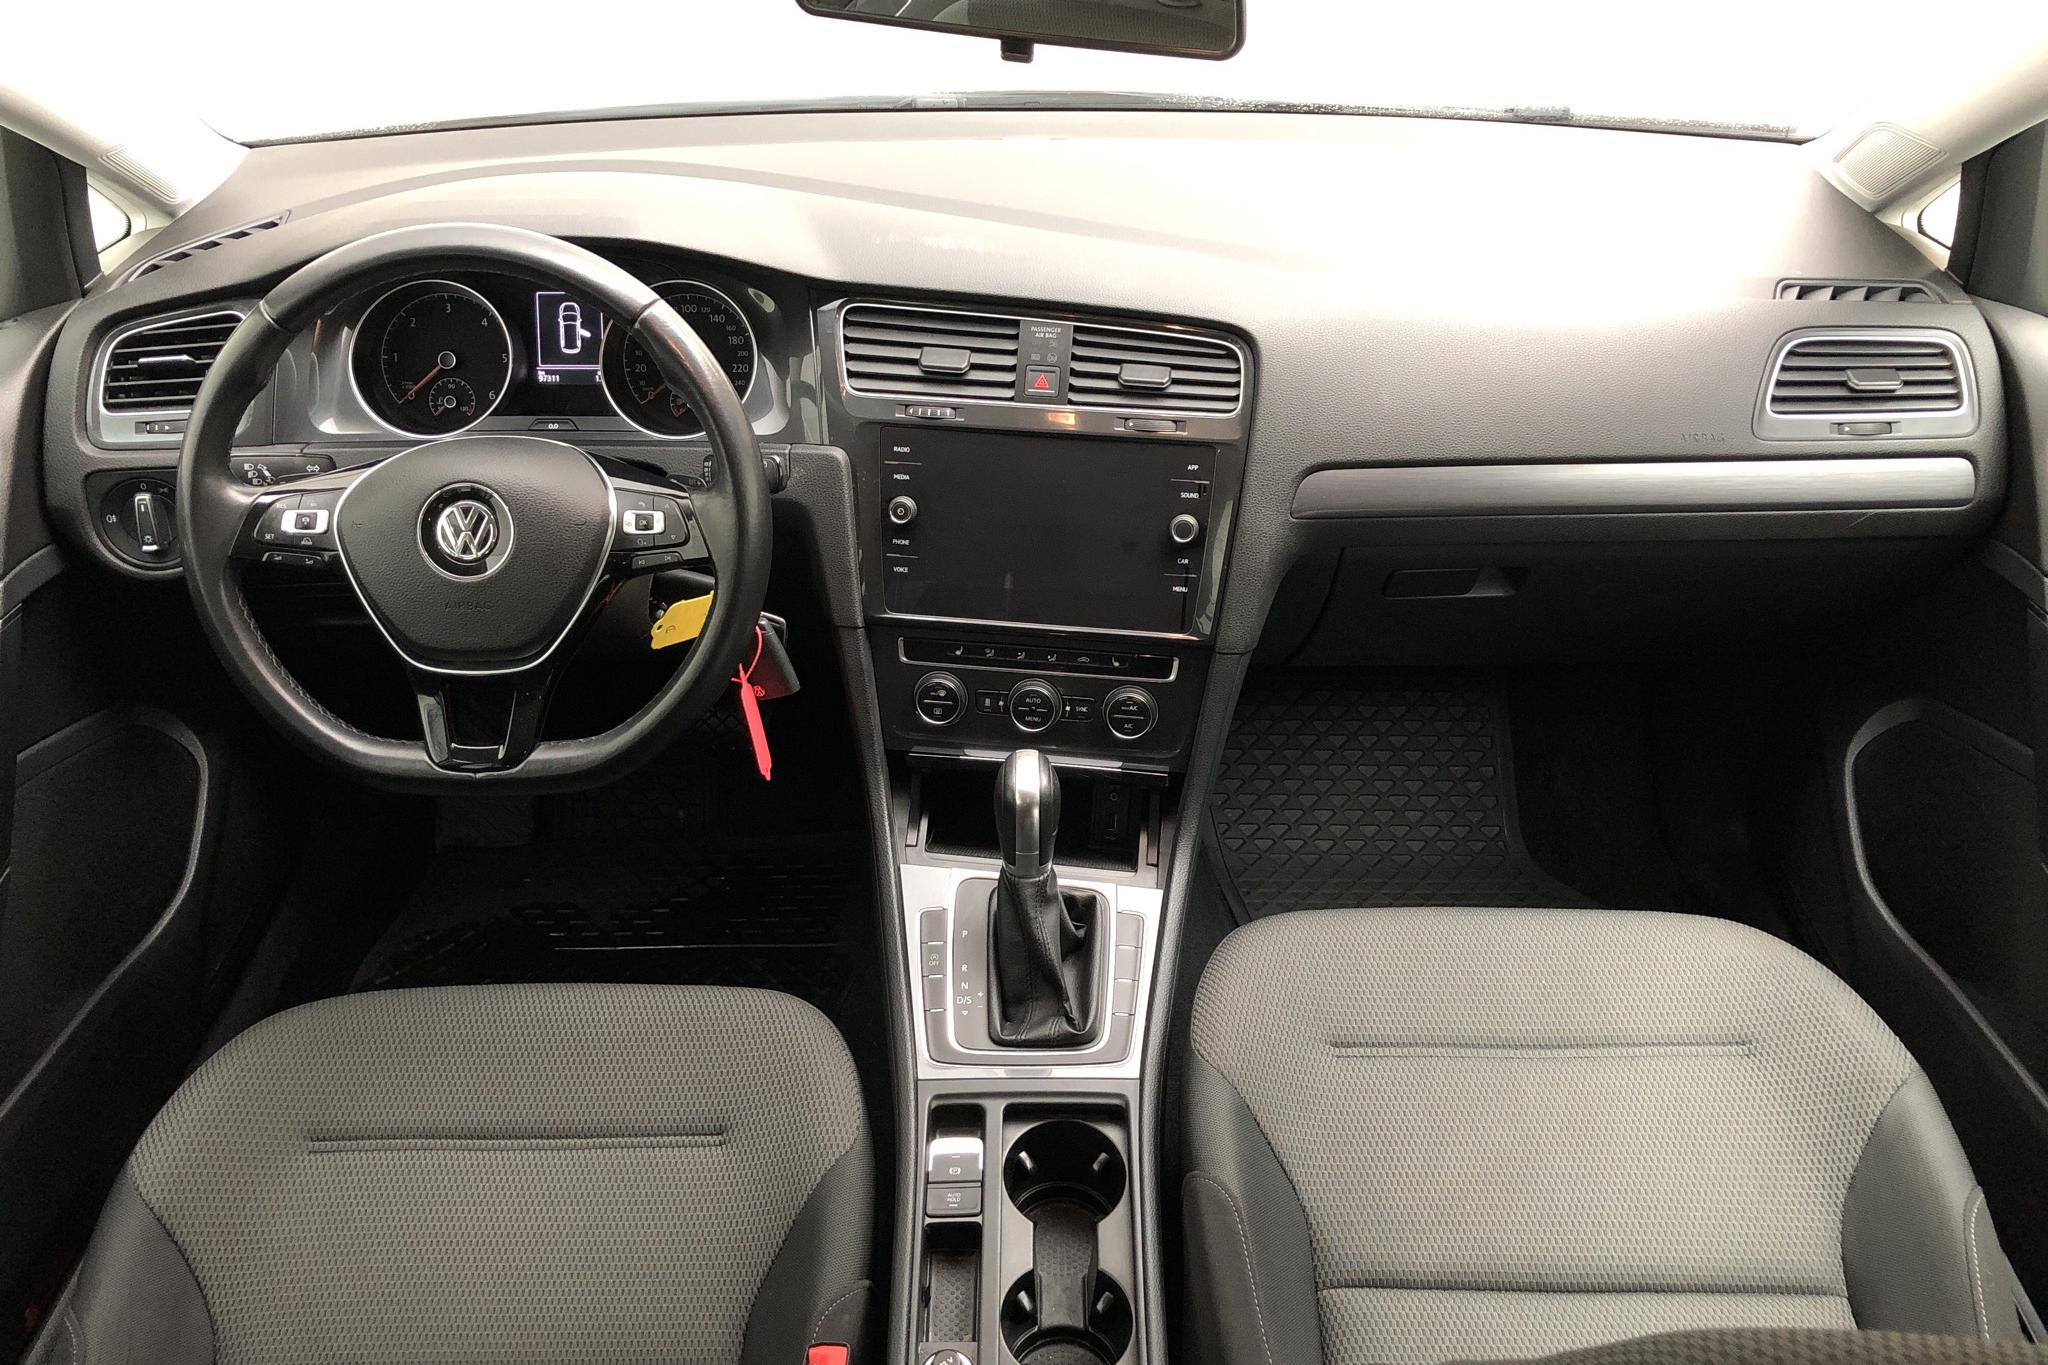 VW Golf VII 1.6 TDI Sportscombi (115hk) - 97 310 km - Automatic - white - 2018